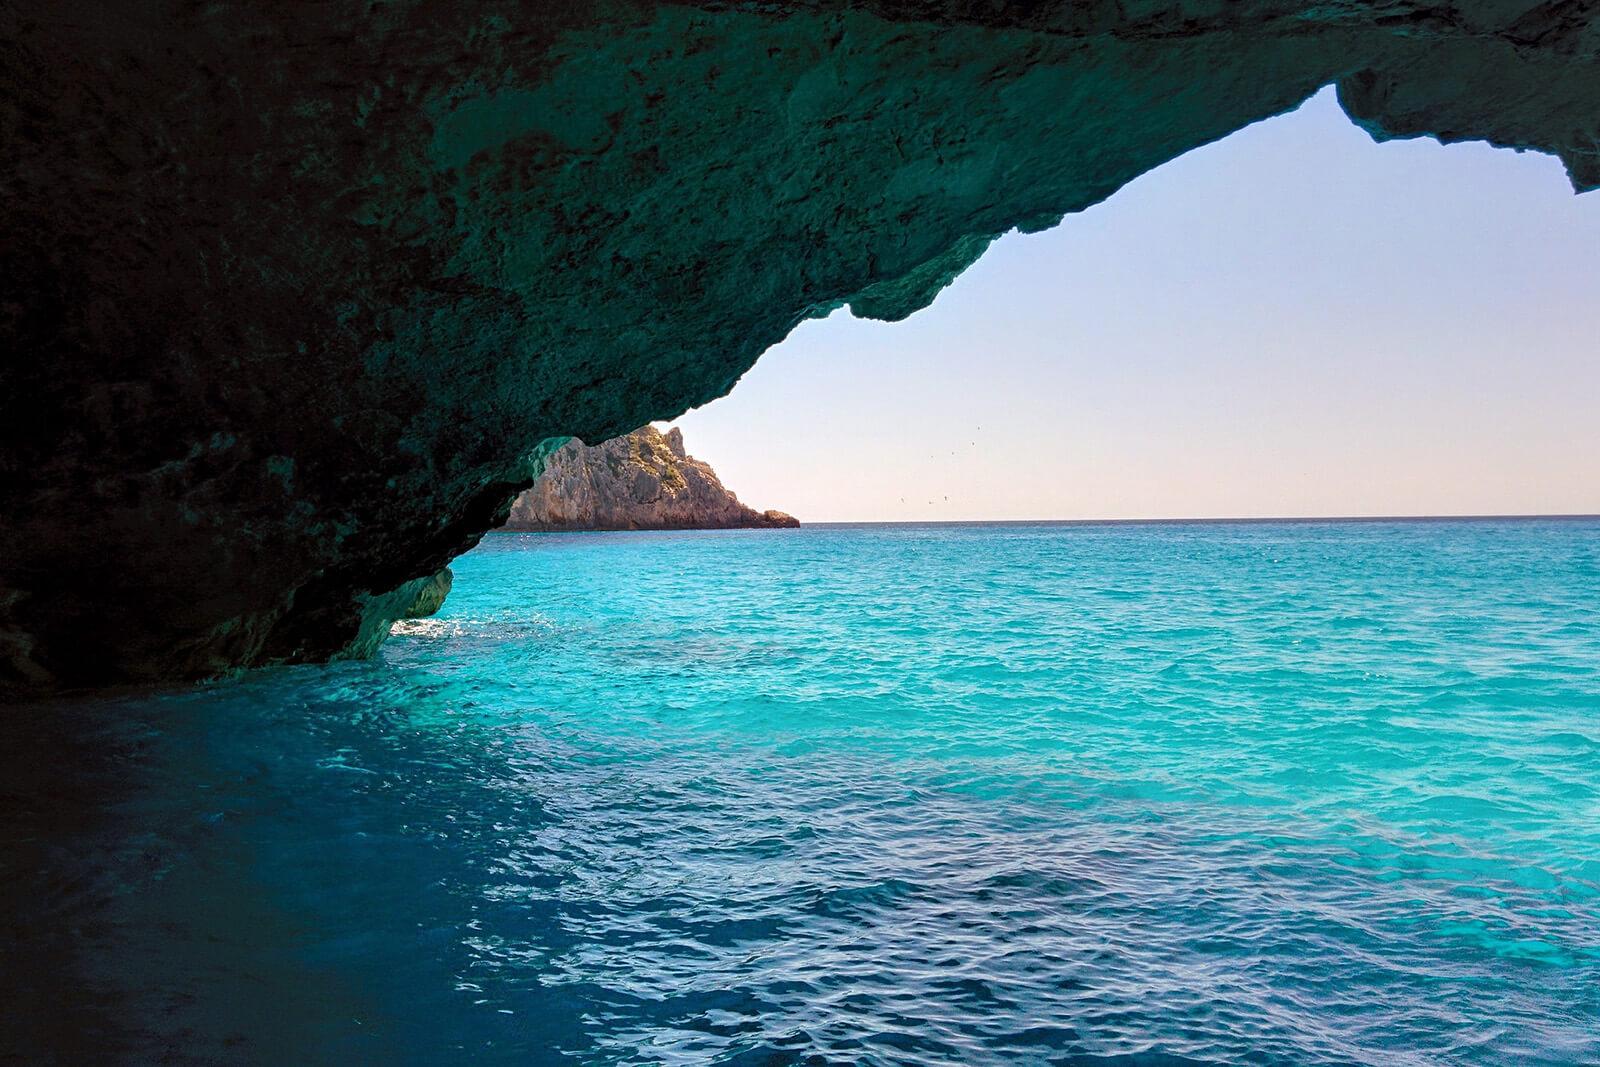 The beautiful Blue Caves of Zakynthos Island, Greece